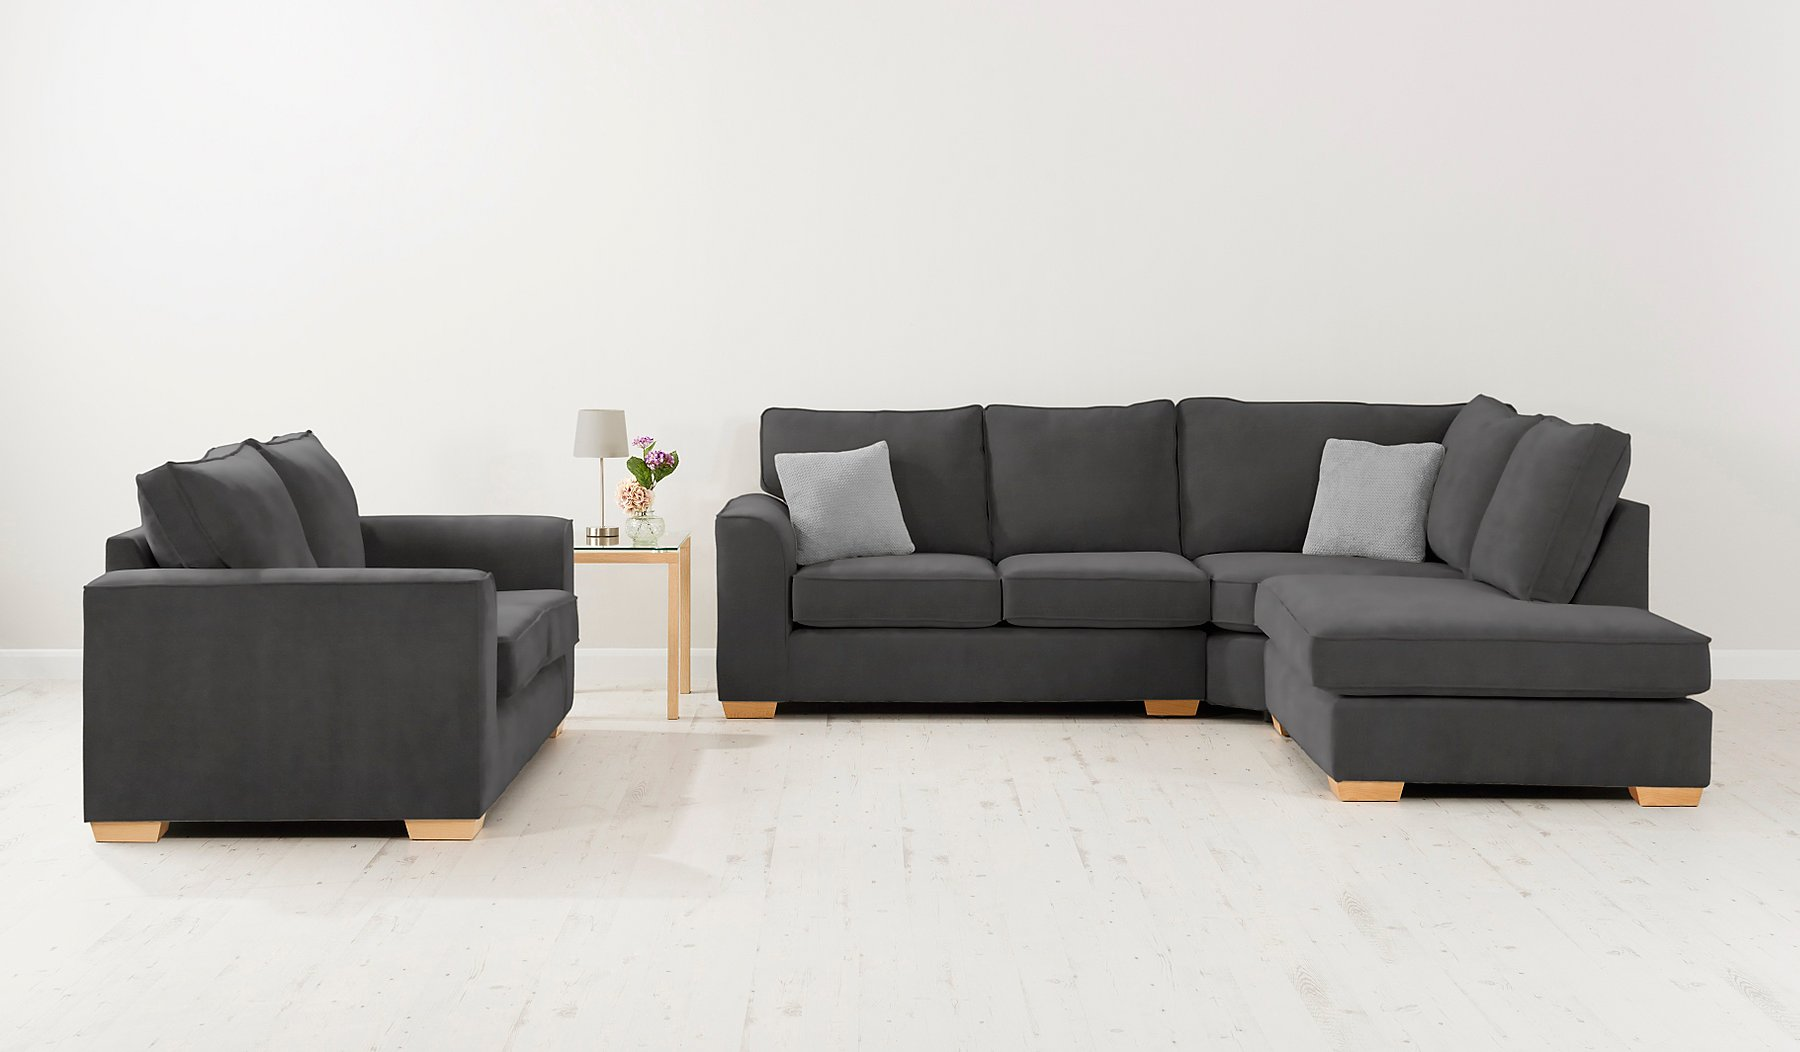 Asda direct lincoln sofa bed refil sofa for Velour divan beds